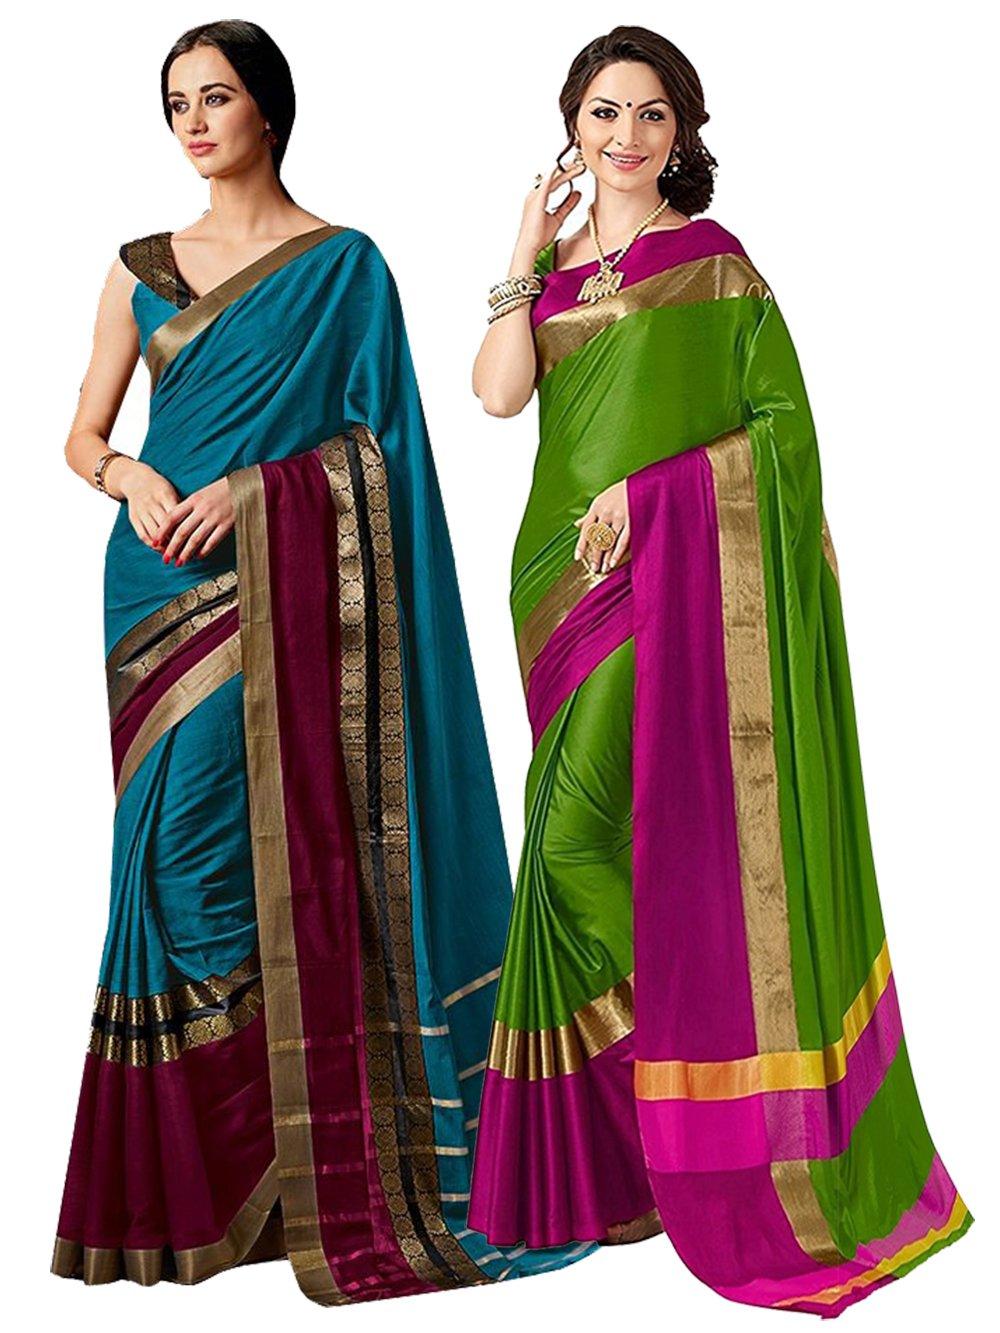 ELINA FASHION Pack Two Sarees Indian Women Cotton Art Silk Printed Weaving Border Saree    Sari Combo (Multi 14)